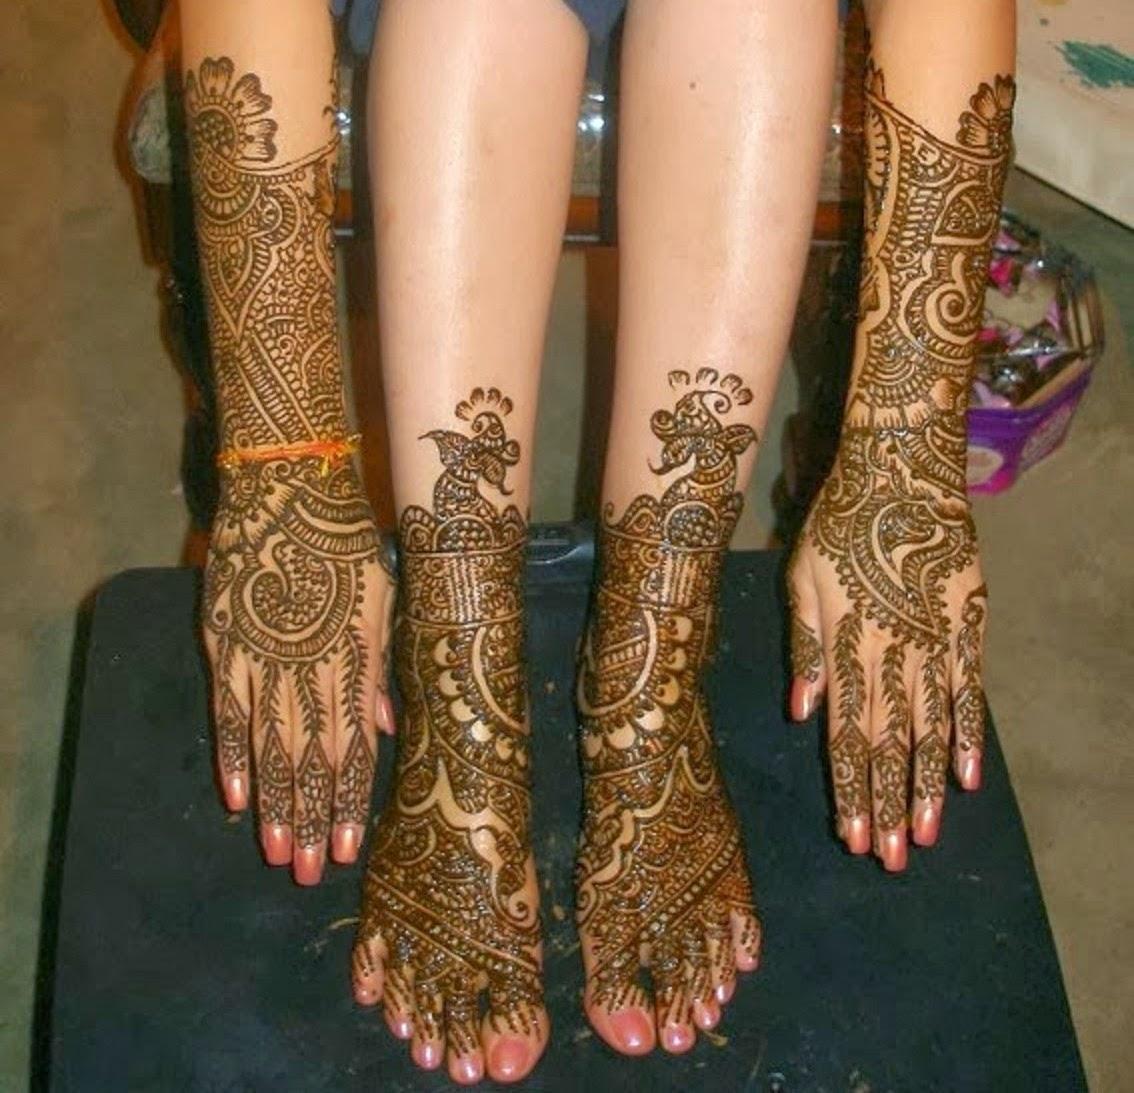 Bridal Mehndi Designs New Bridal Feet And Hand Mehndi